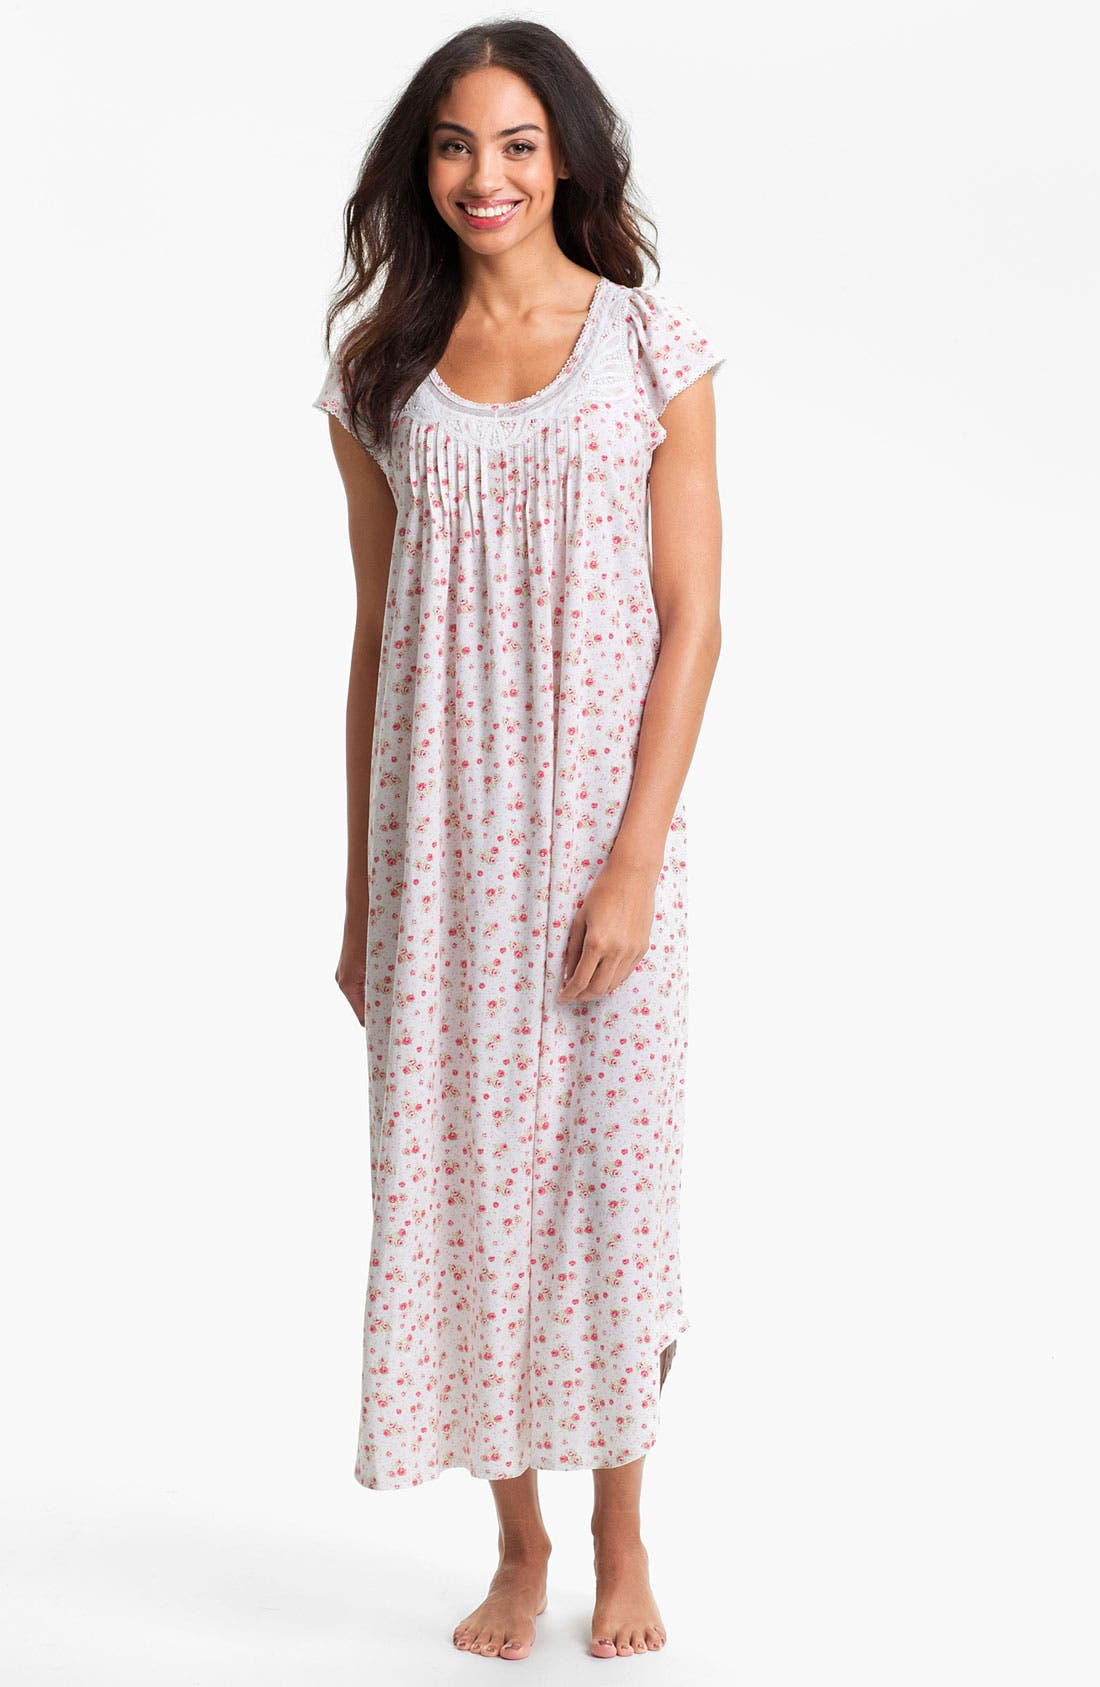 Main Image - Carole Hochman Designs 'Rose Cottage' Nightgown